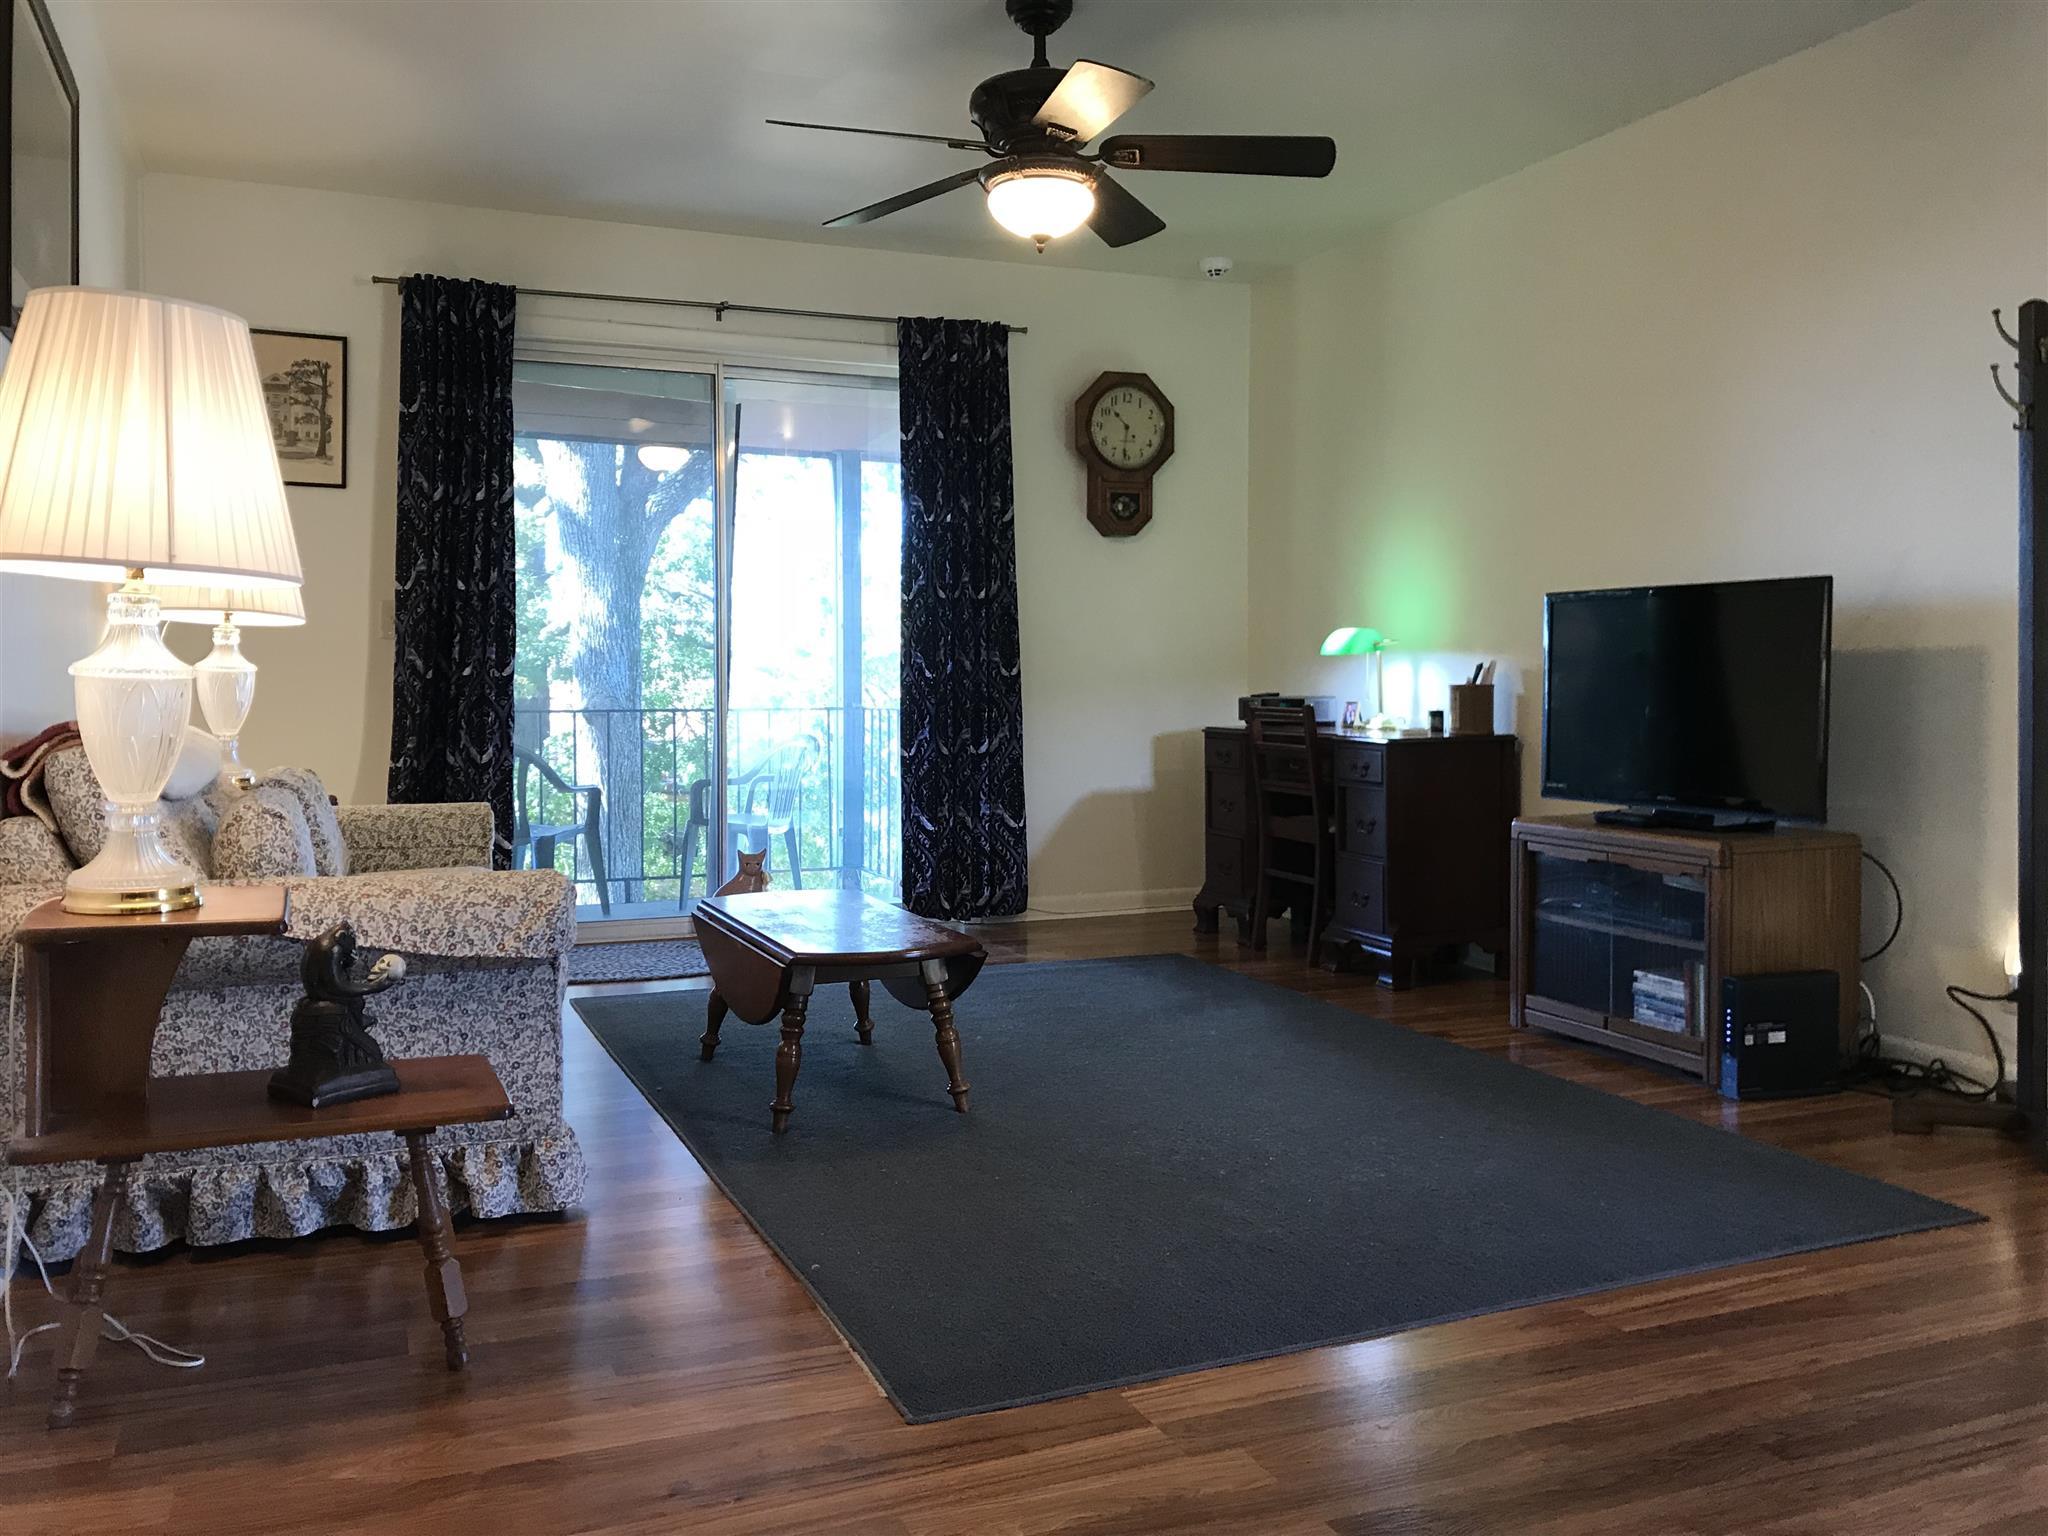 555 N Dupont Ave Apt C48, Madison, TN 37115 - Madison, TN real estate listing